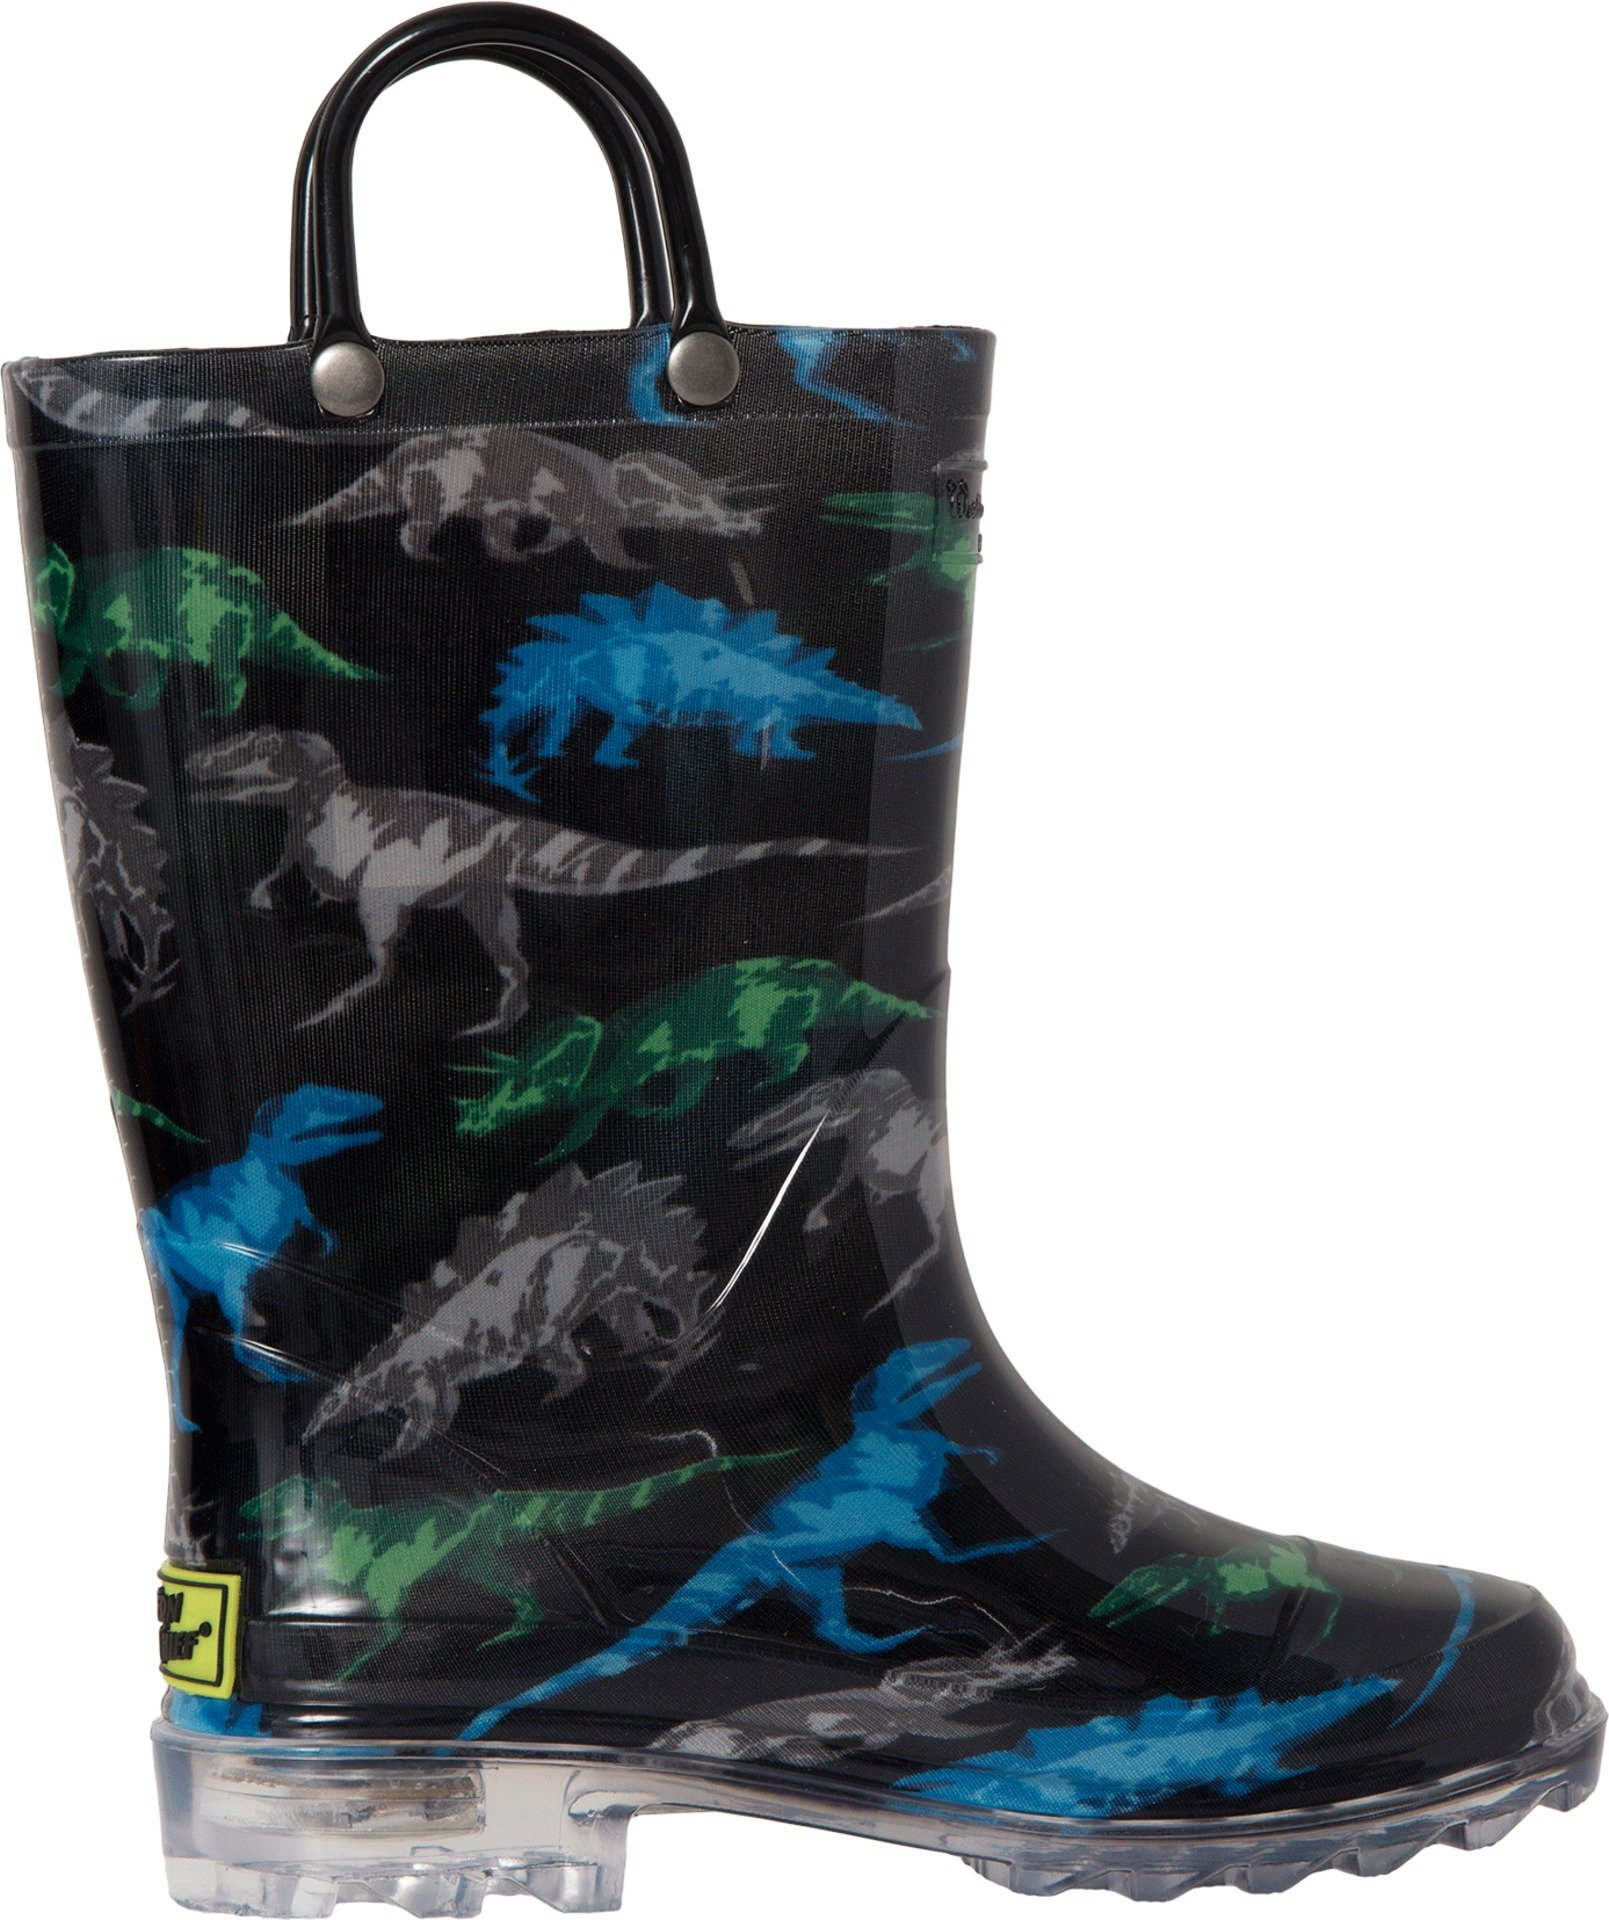 Western Chief Boys' Light-up Waterproof Rain Boot, Dinosaur Friends, 1 M US Little Kid by Western Chief (Image #3)